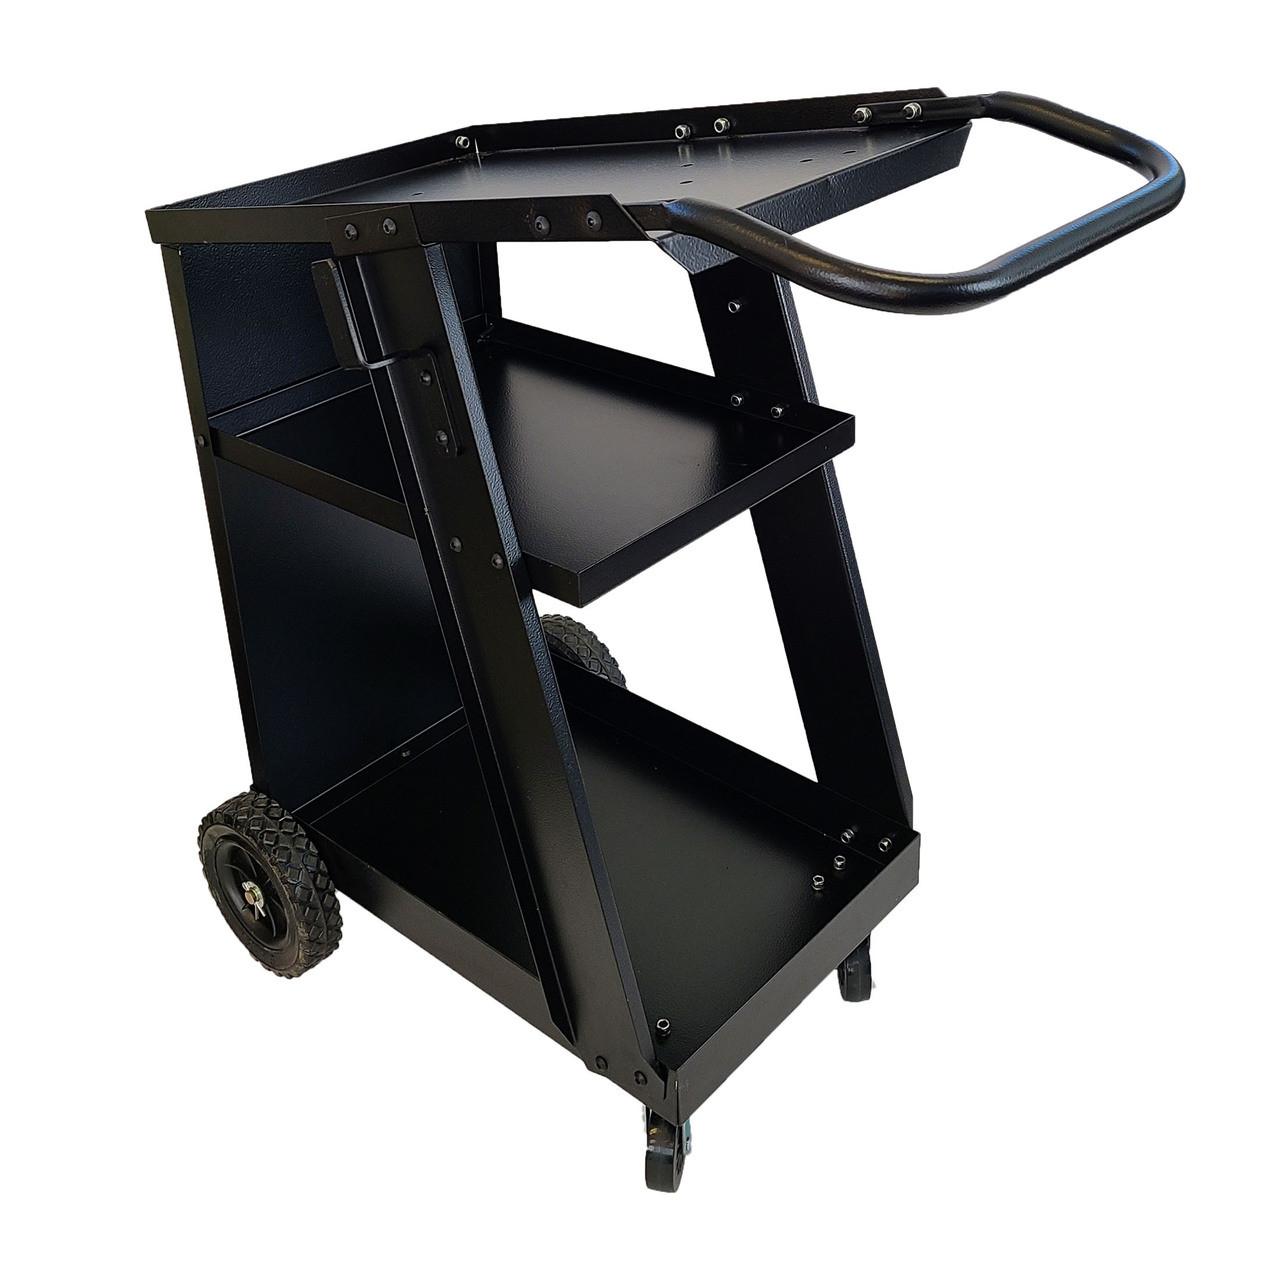 Killer Tools ART73 Plastic Repair  and welding System 110v  Cart